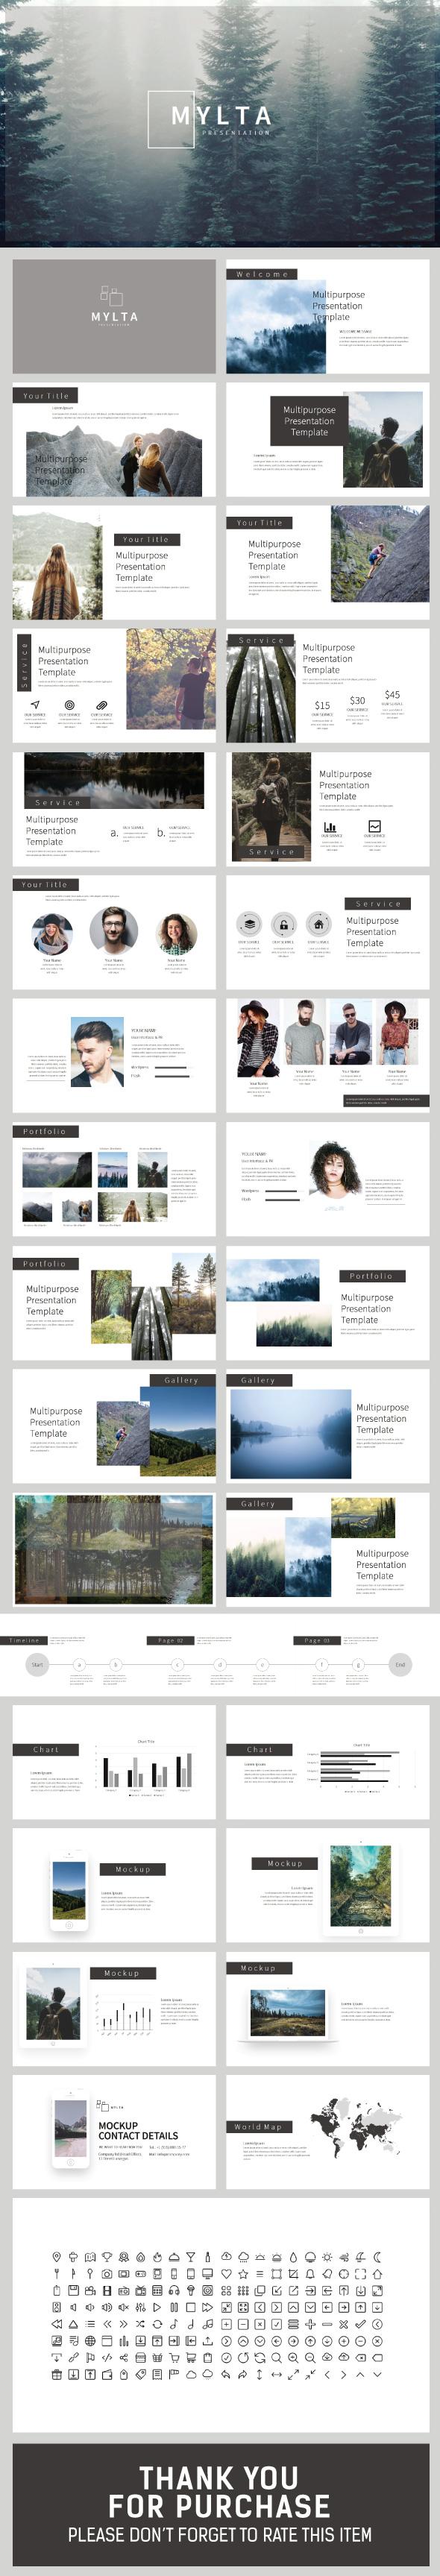 Mylta Google Slide Presentation - Google Slides Presentation Templates